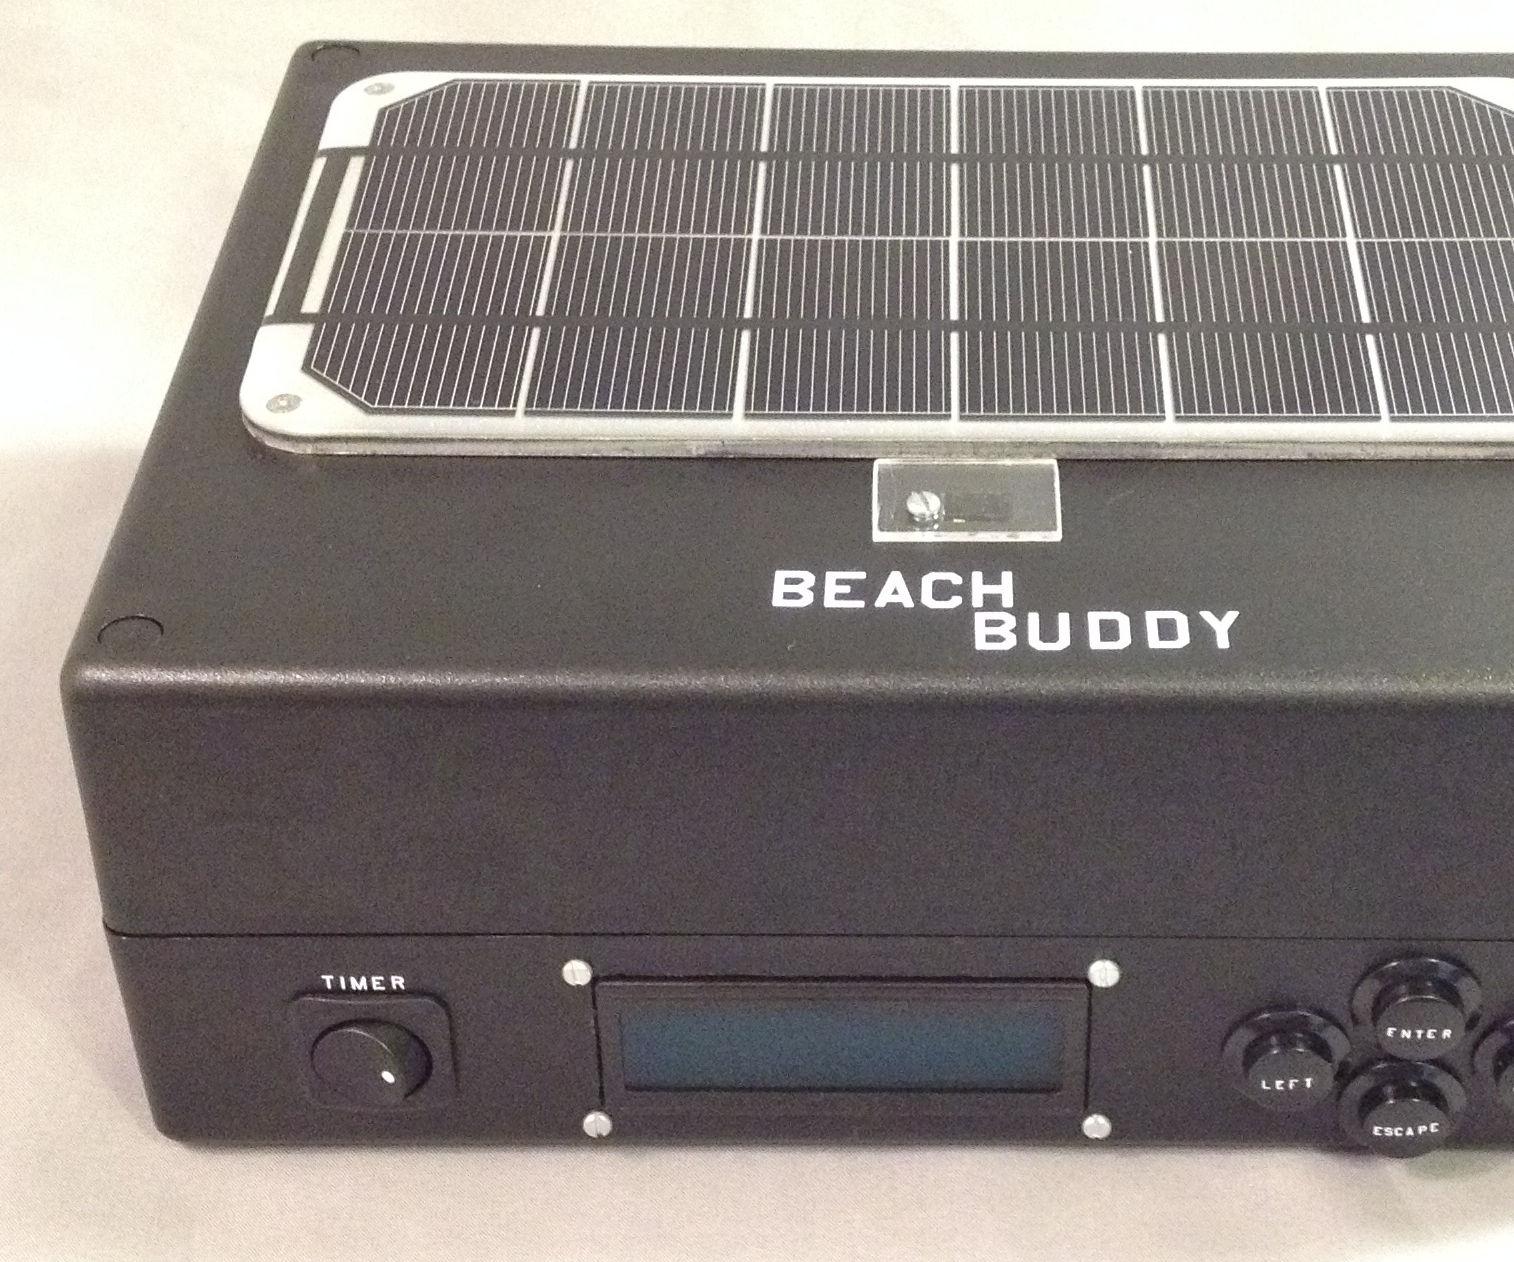 Beach Buddy: 3-in-1 Solar Phone Charger, Boombox, and Sunburn Timer Calculator